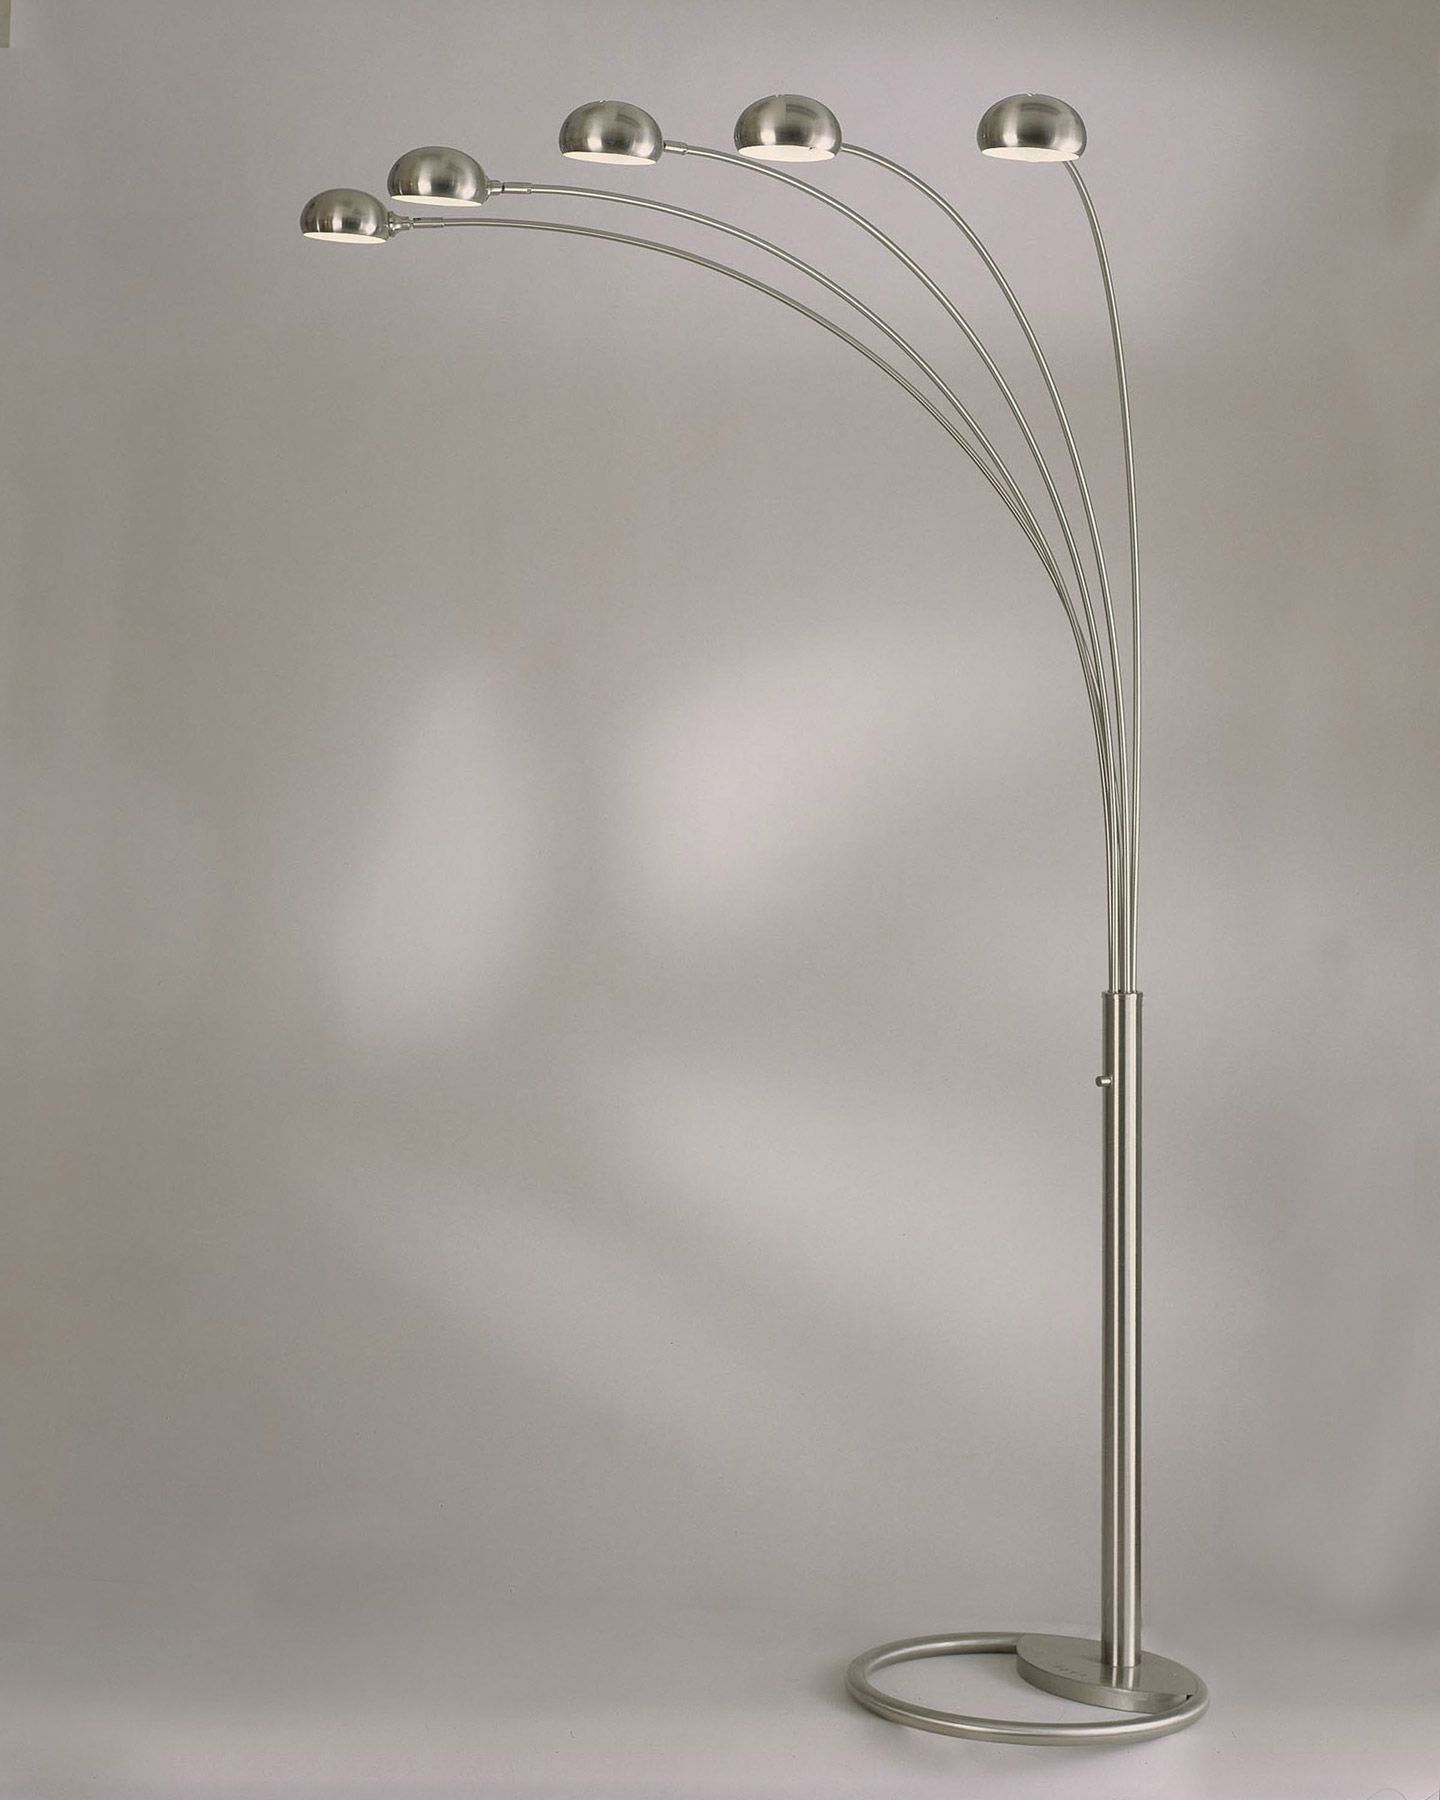 home lamps floor lamps arc floor lamps nova lighting 4231rx. Black Bedroom Furniture Sets. Home Design Ideas